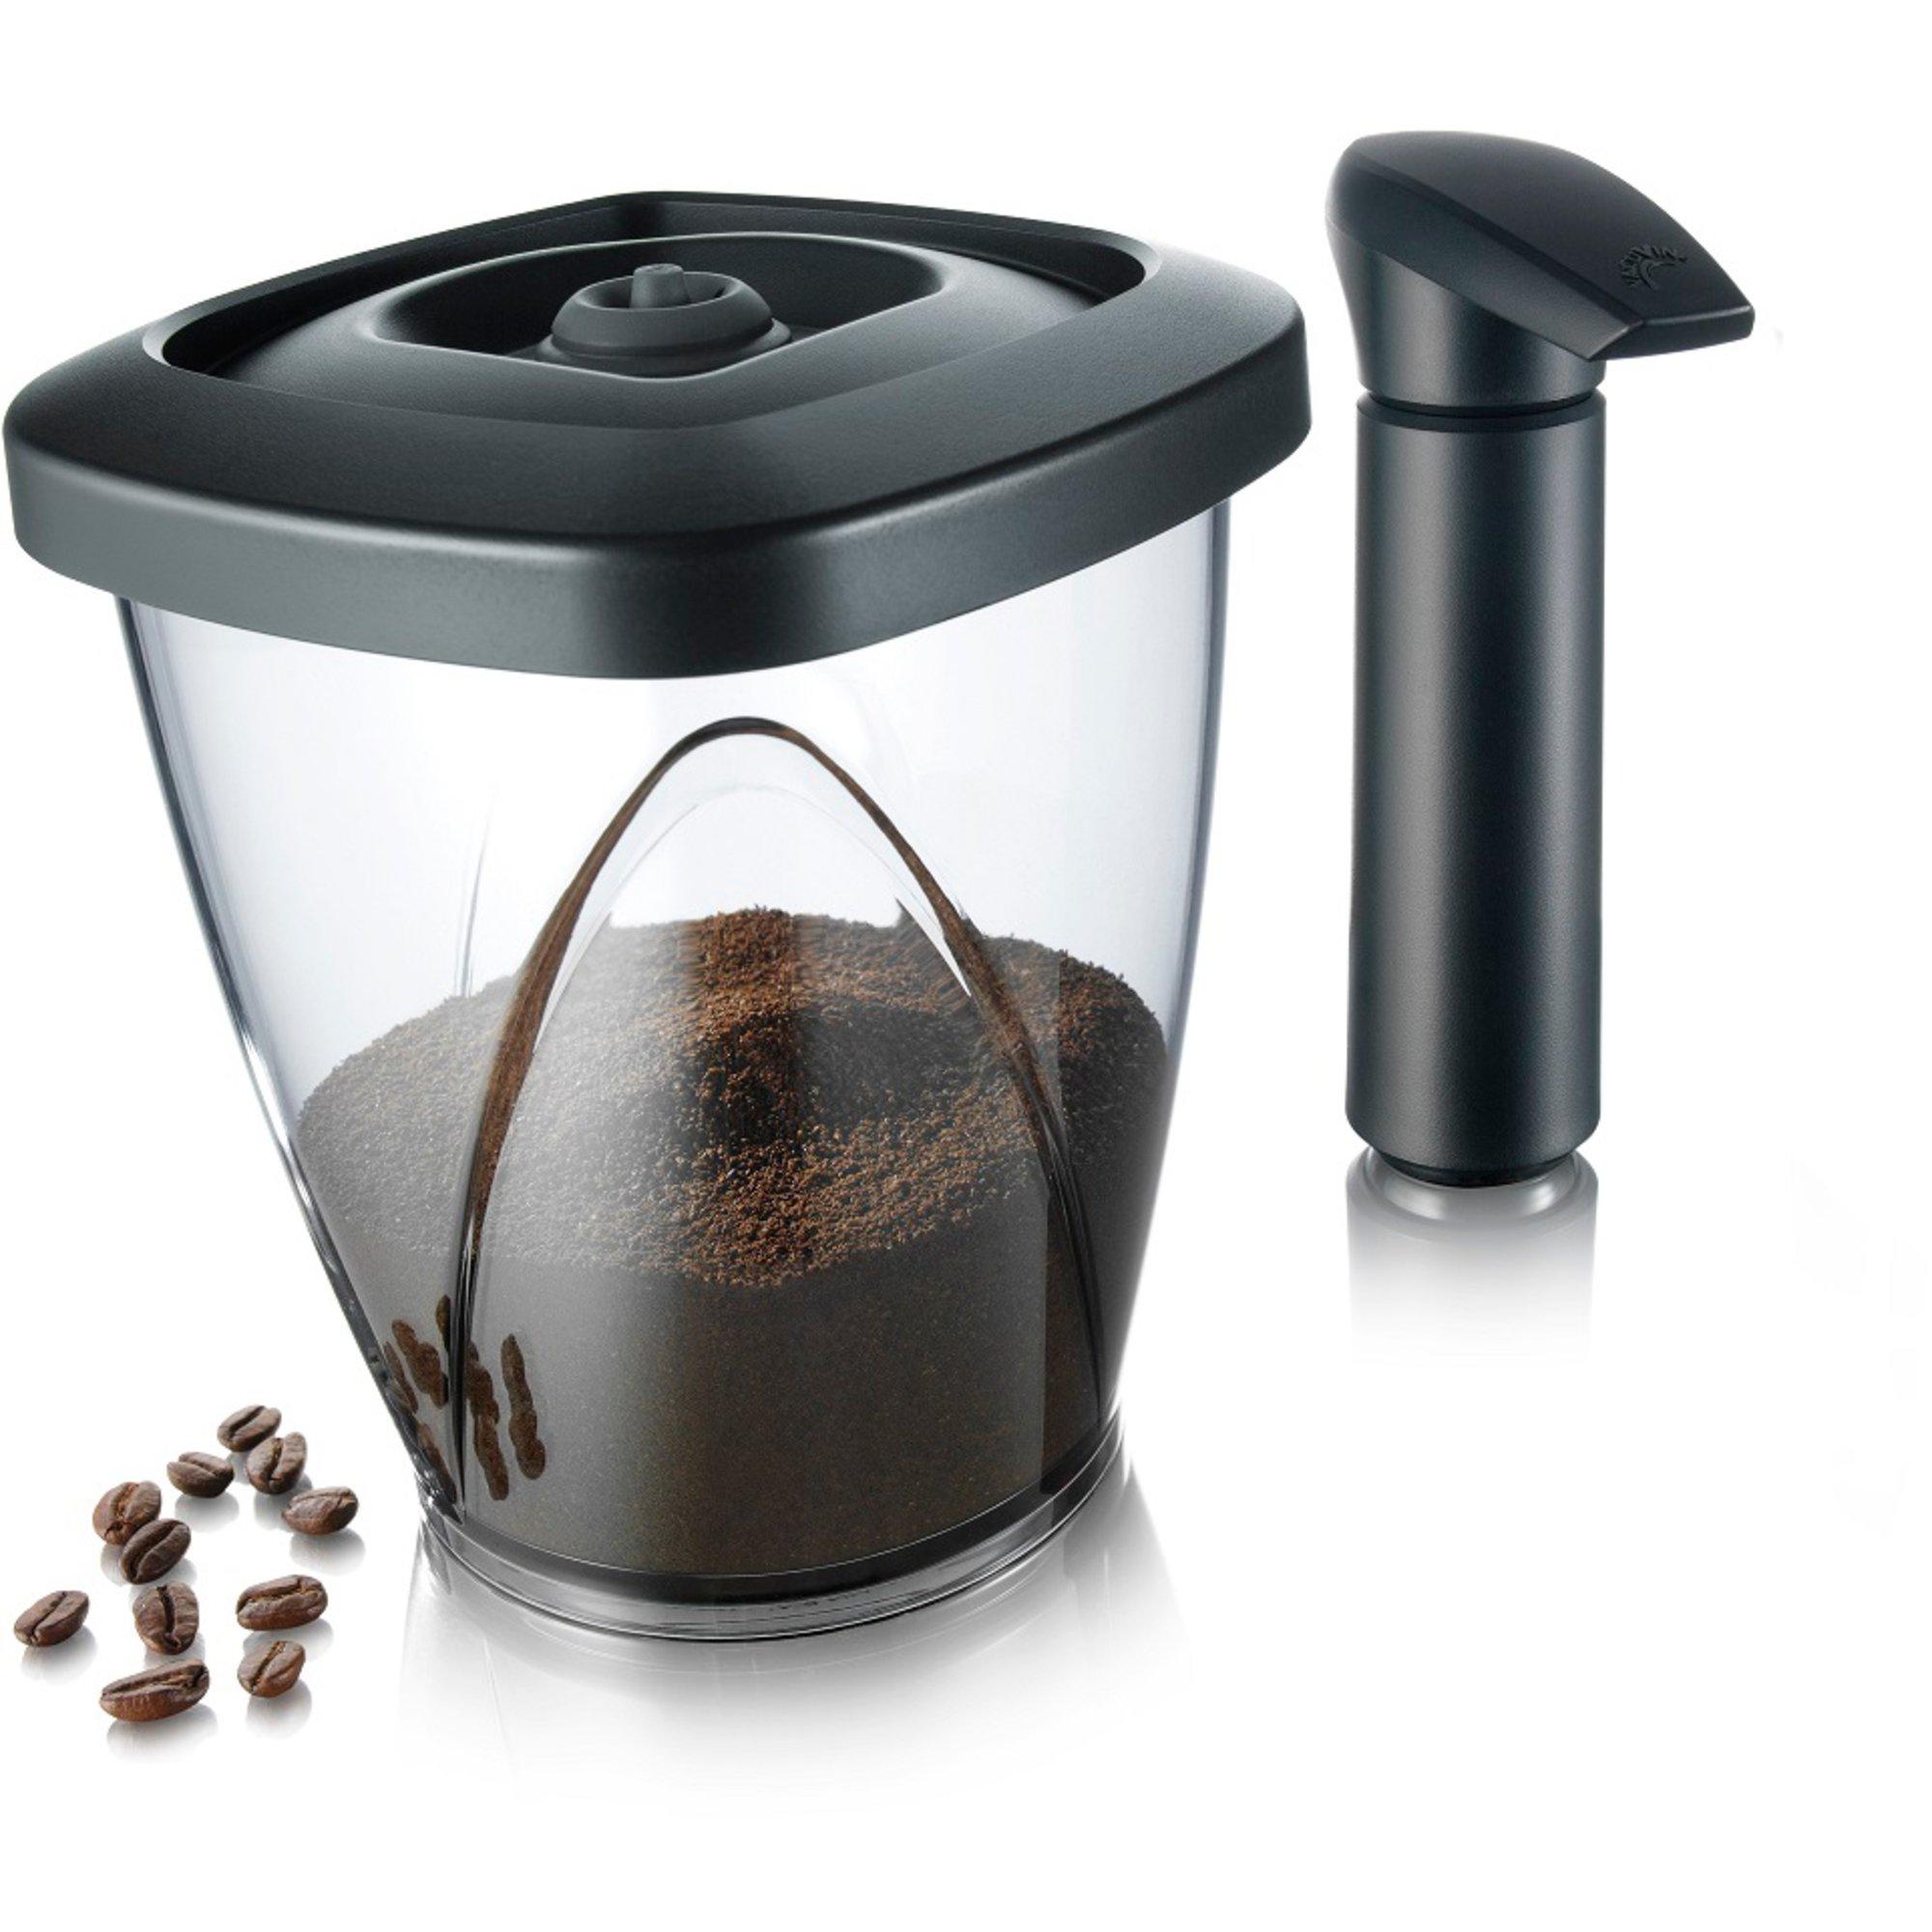 Tomorrow's Kitchen Vakuumbehållare för kaffe